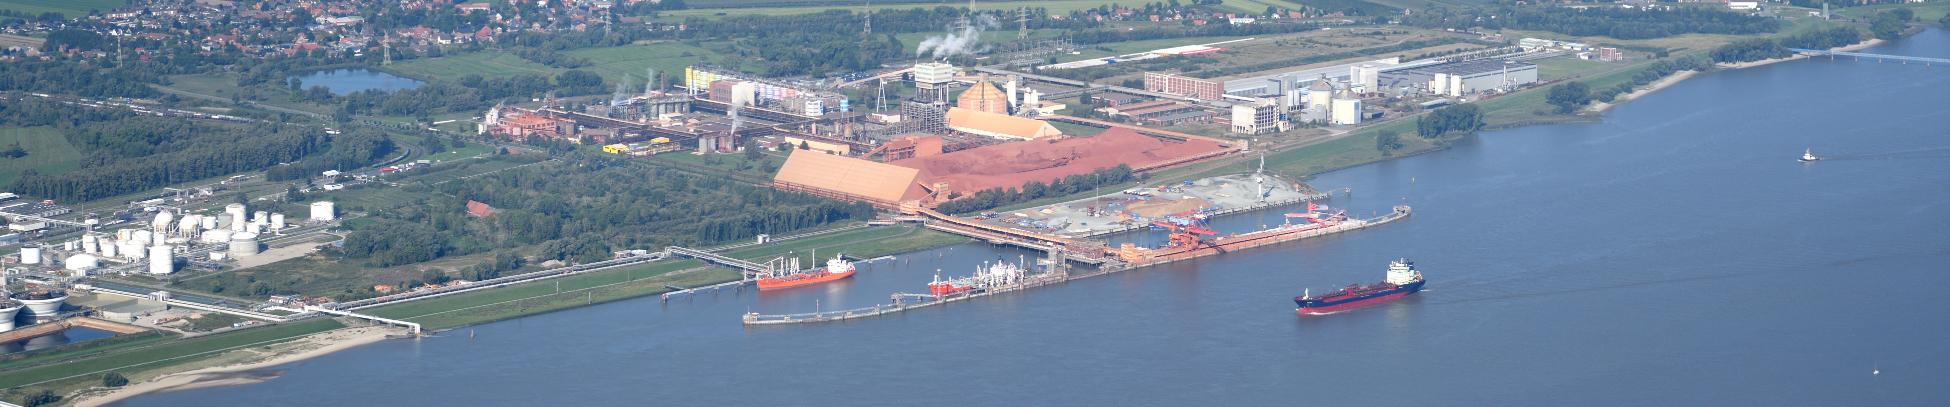 https://www.seaports.de/content/uploads/stade_banner.jpg